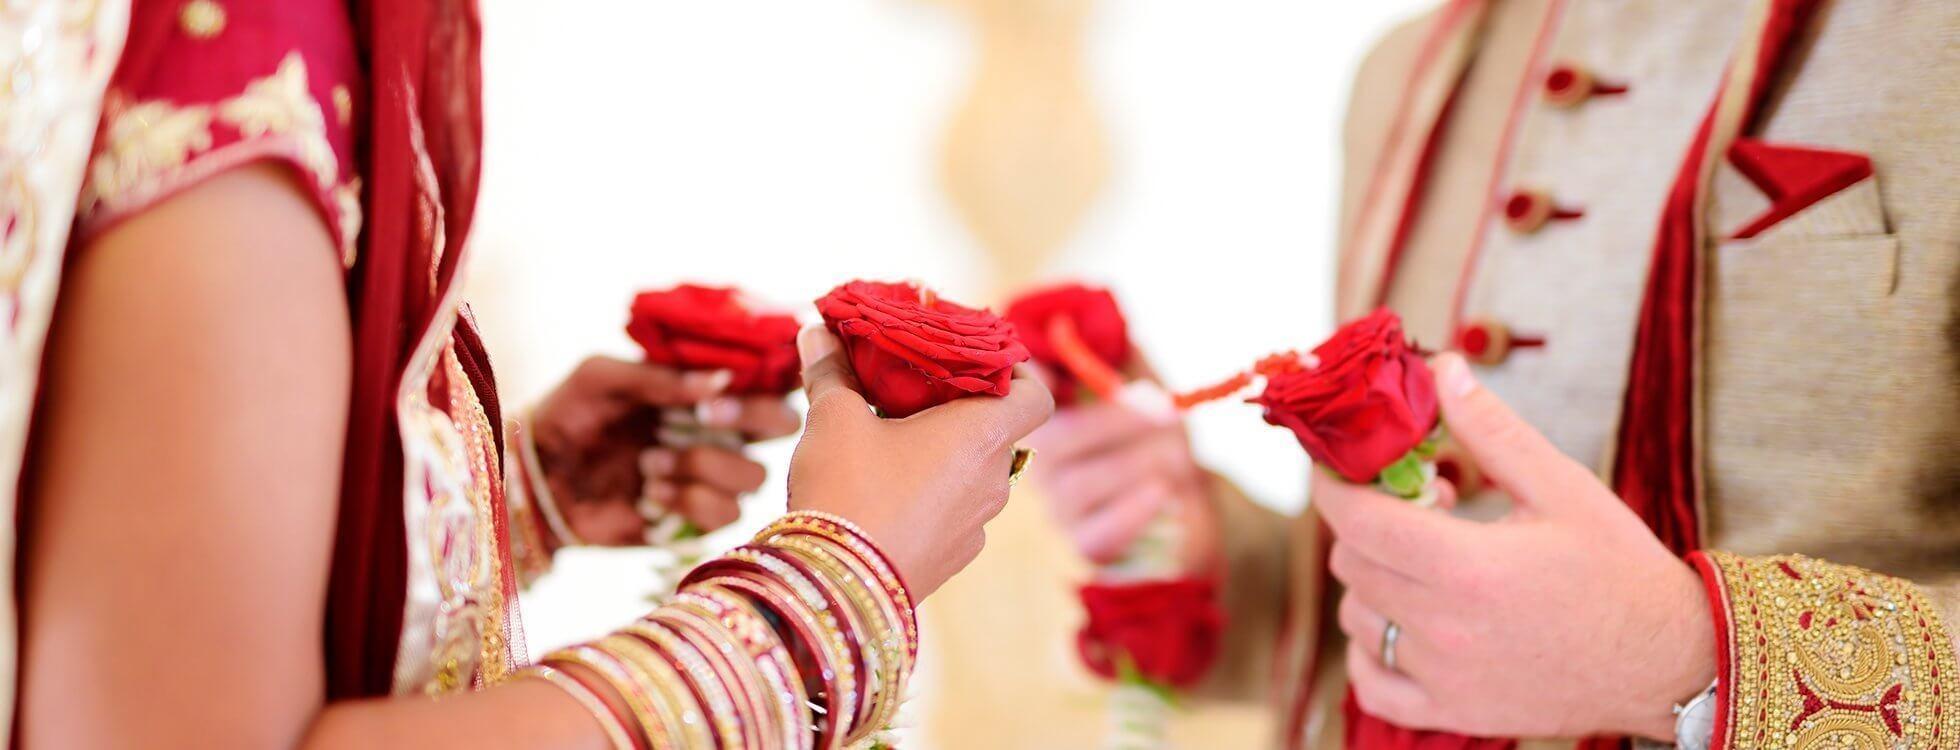 Odisha Matrimony, Matrimonials, Bride, Groom